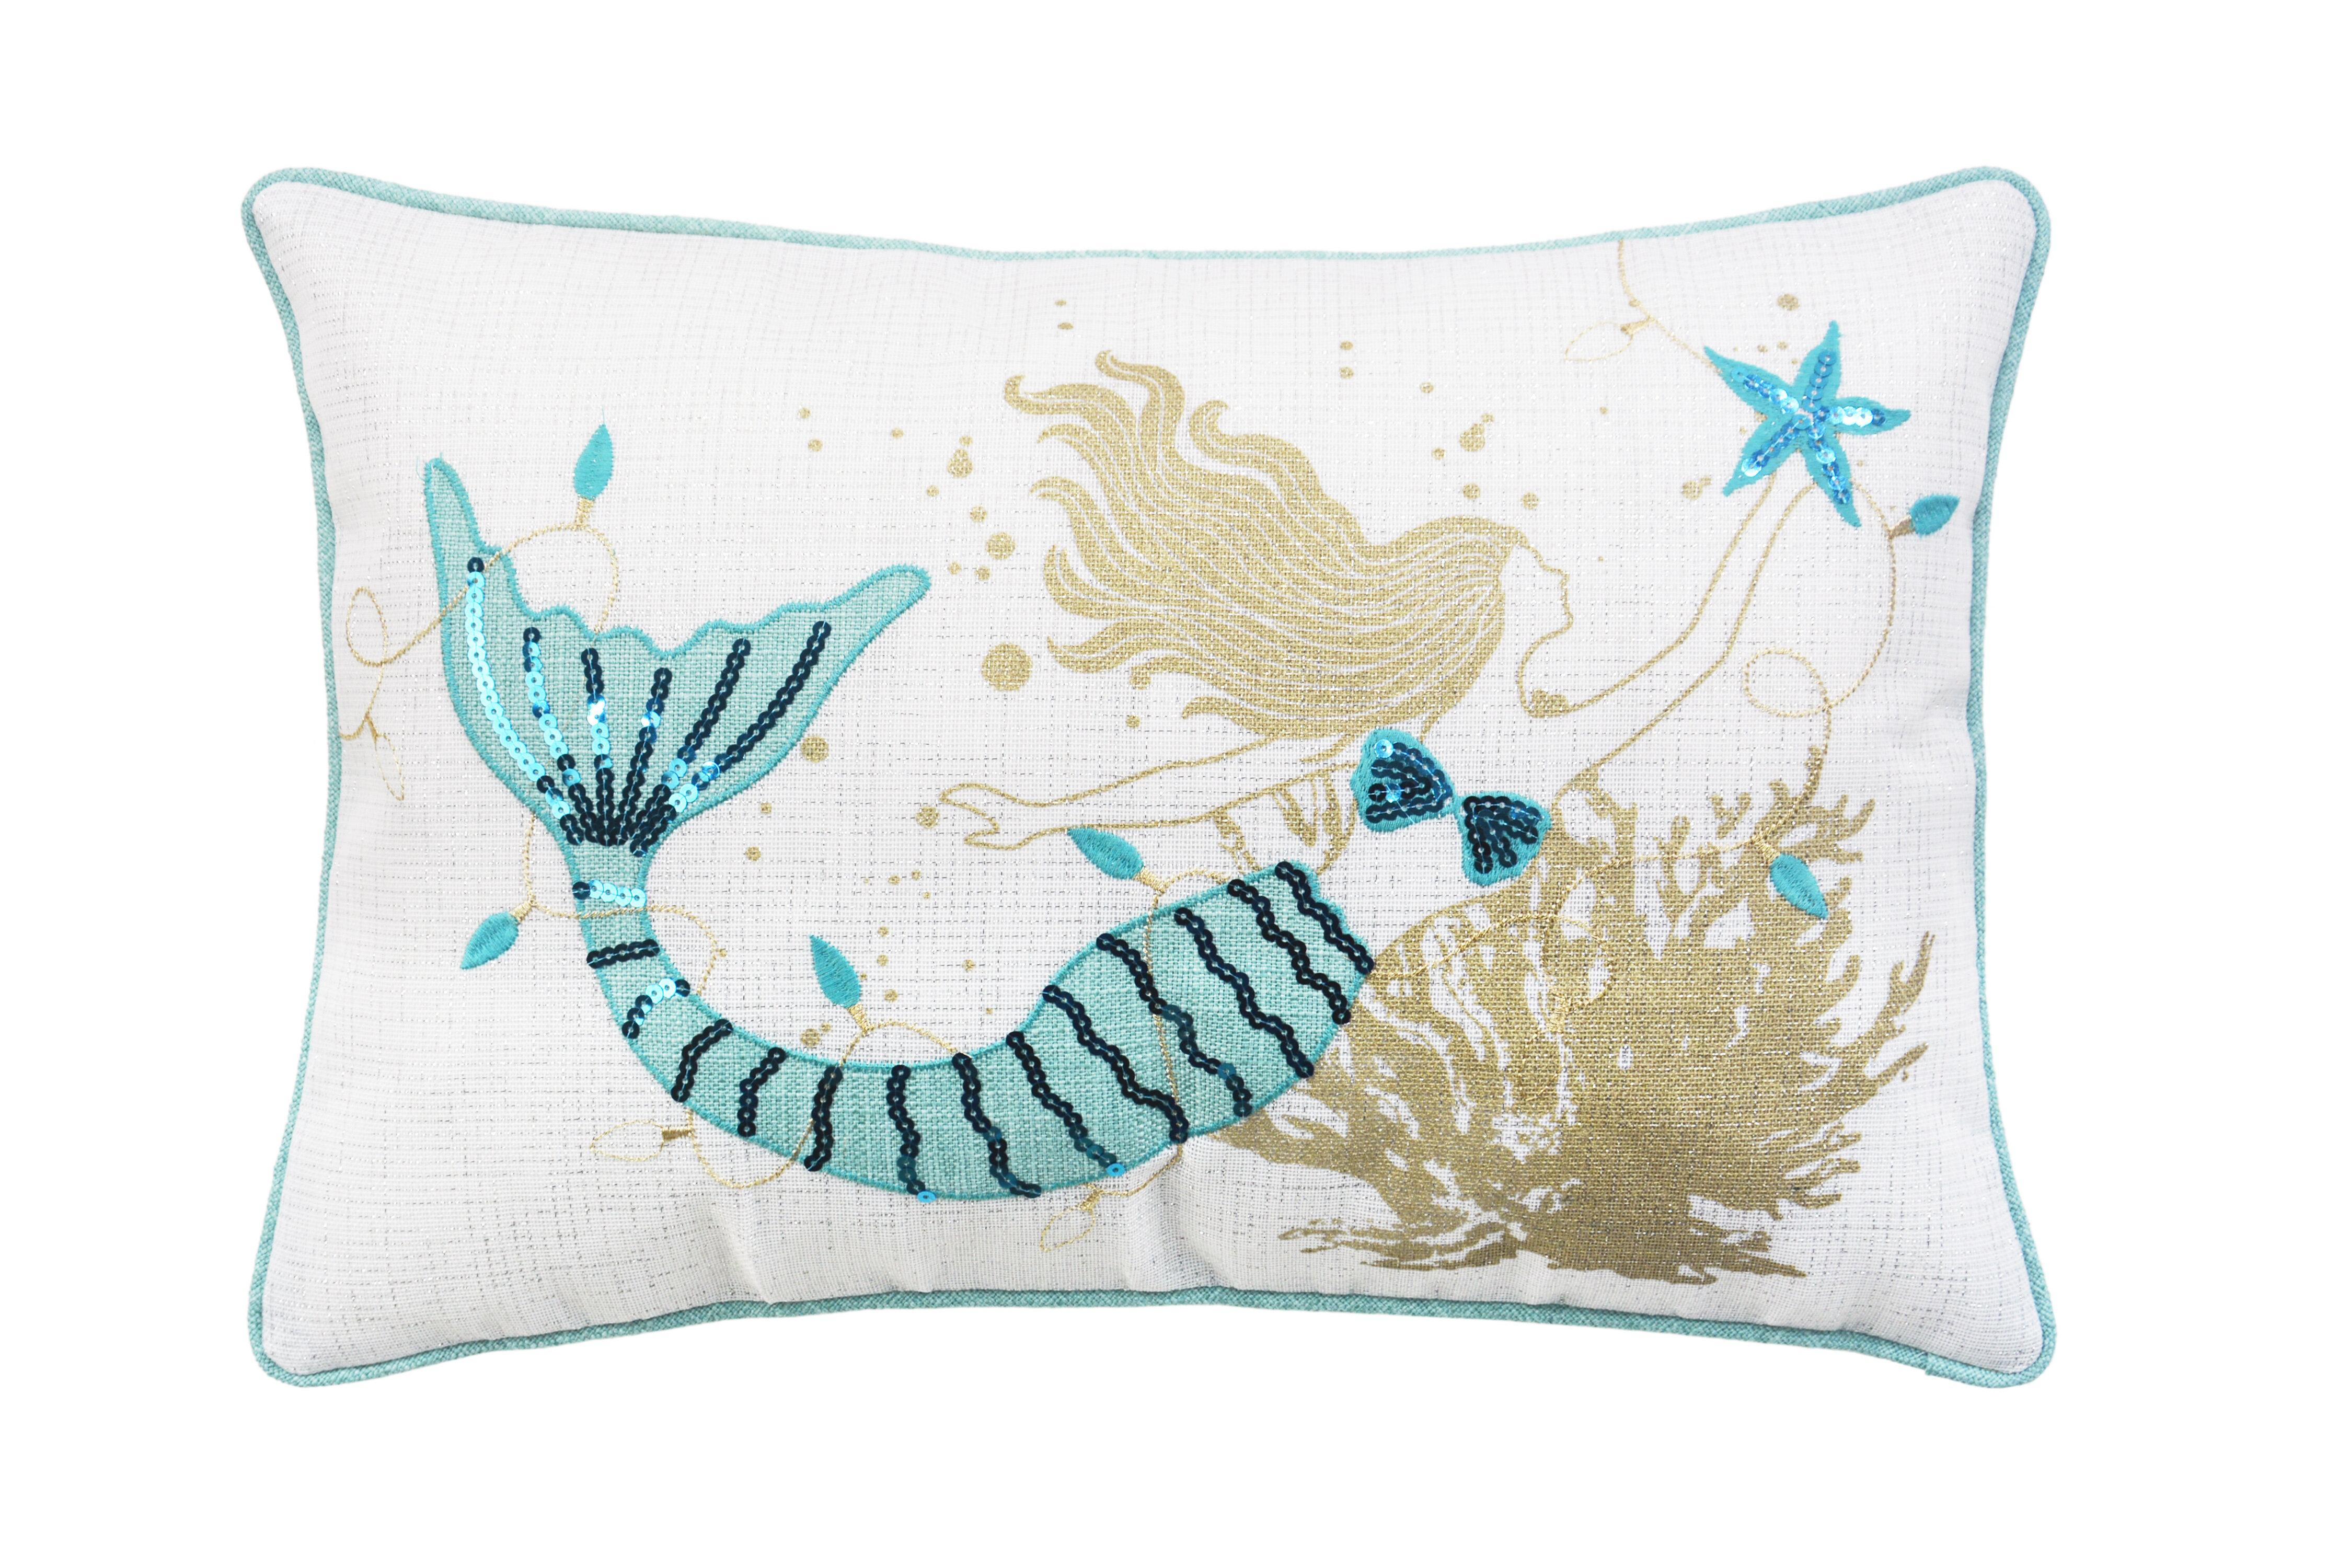 Christmas Indoor Air Quality Throw Pillows You Ll Love In 2021 Wayfair